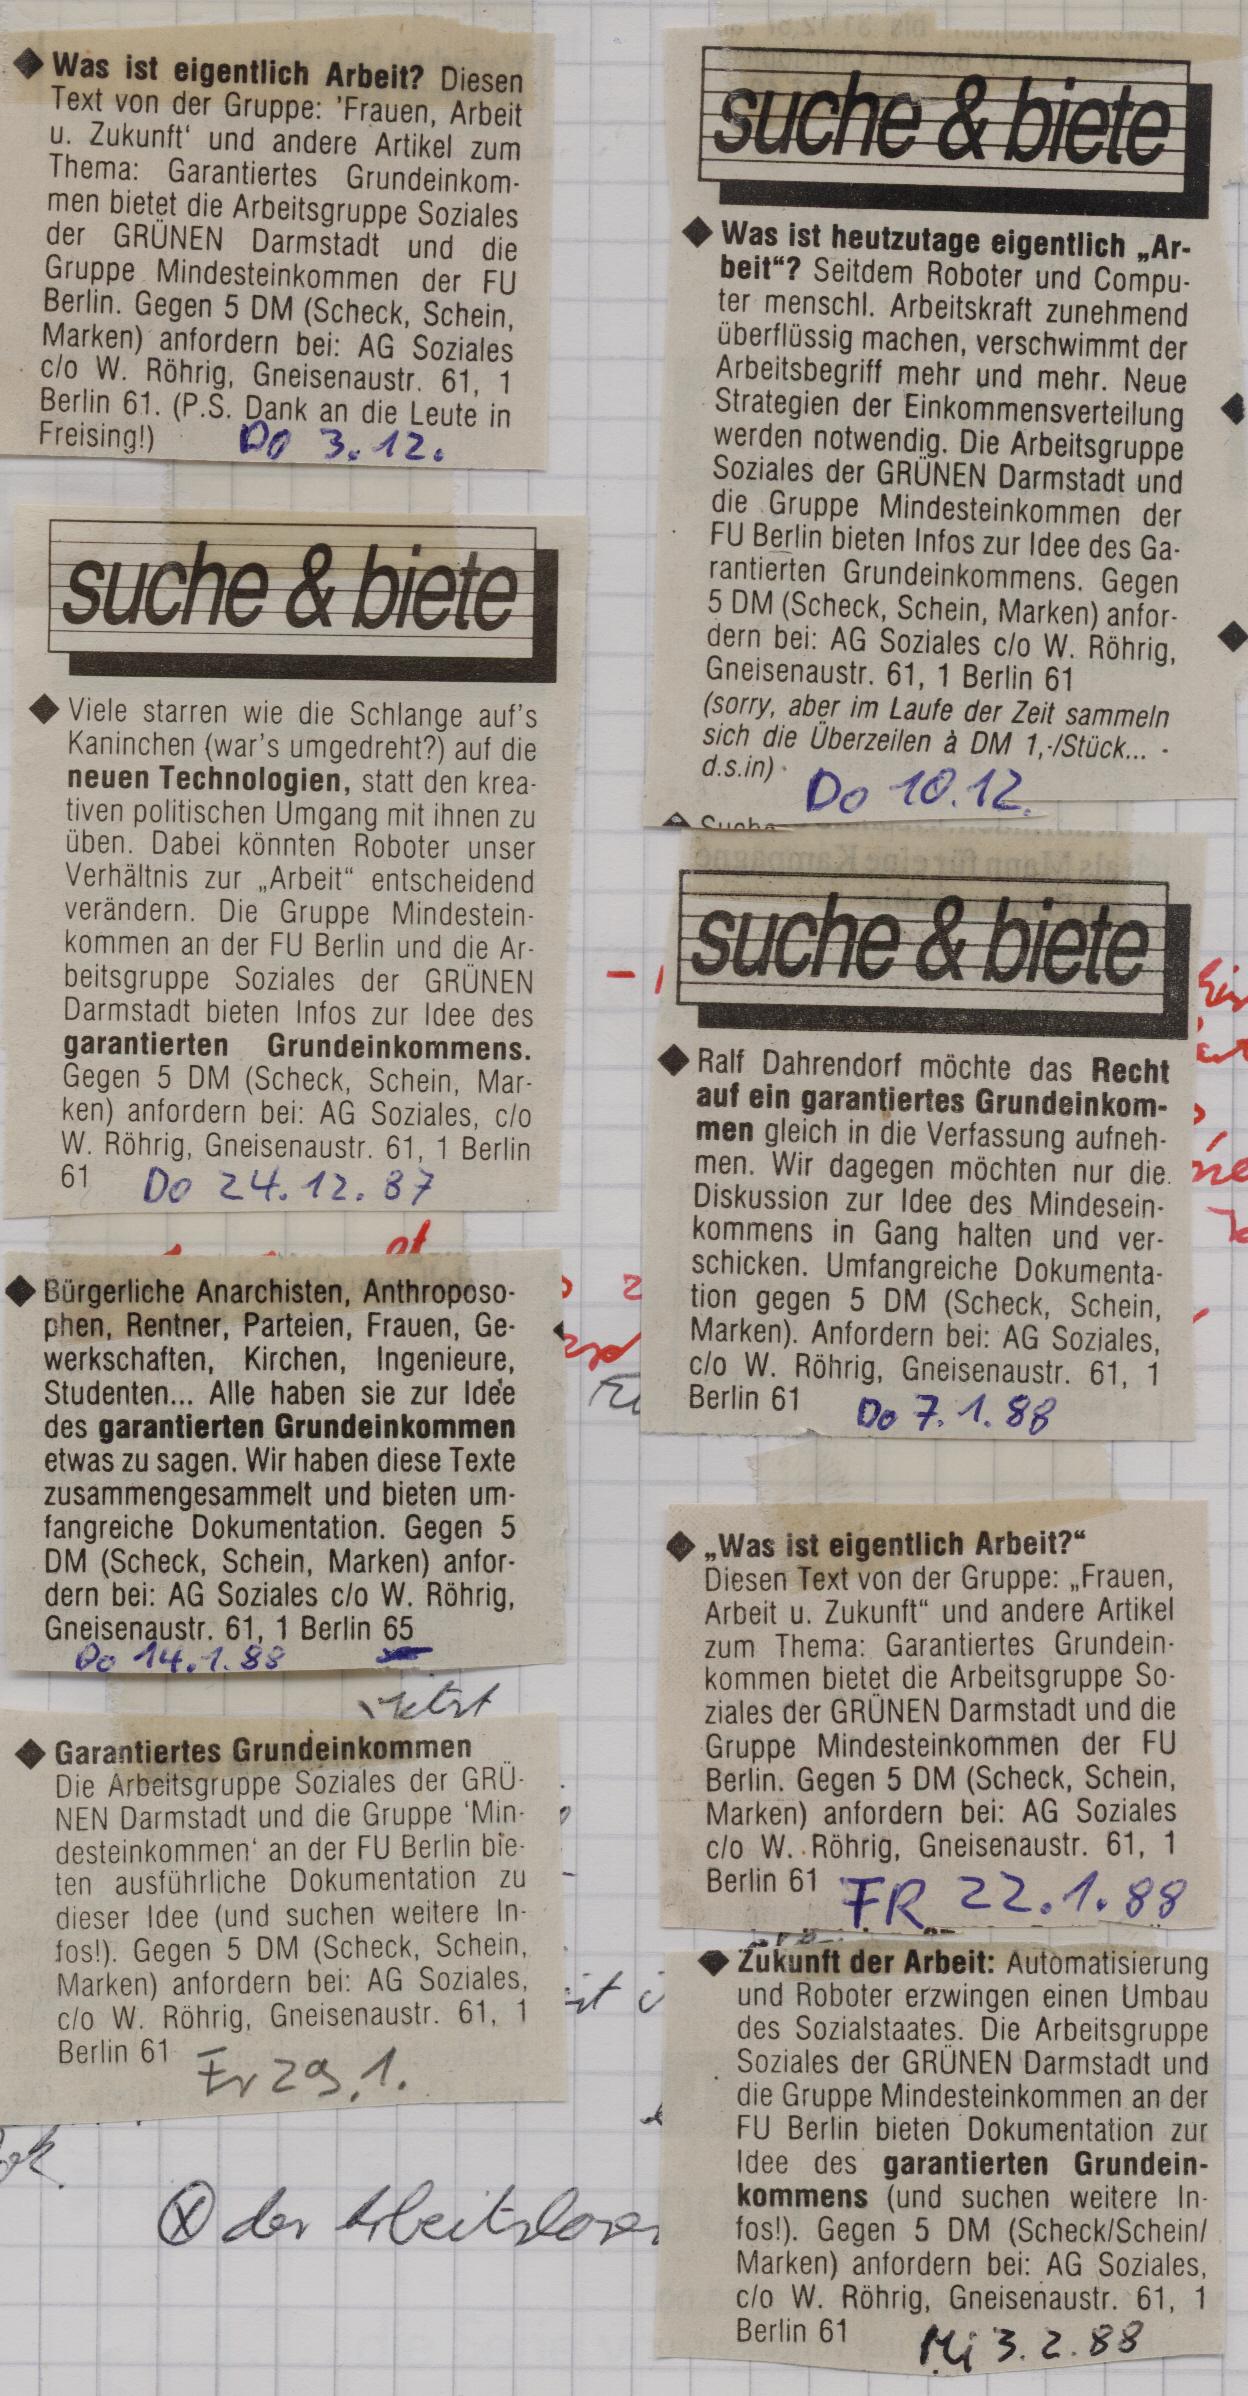 [Anzeigen in taz, 1987/88]